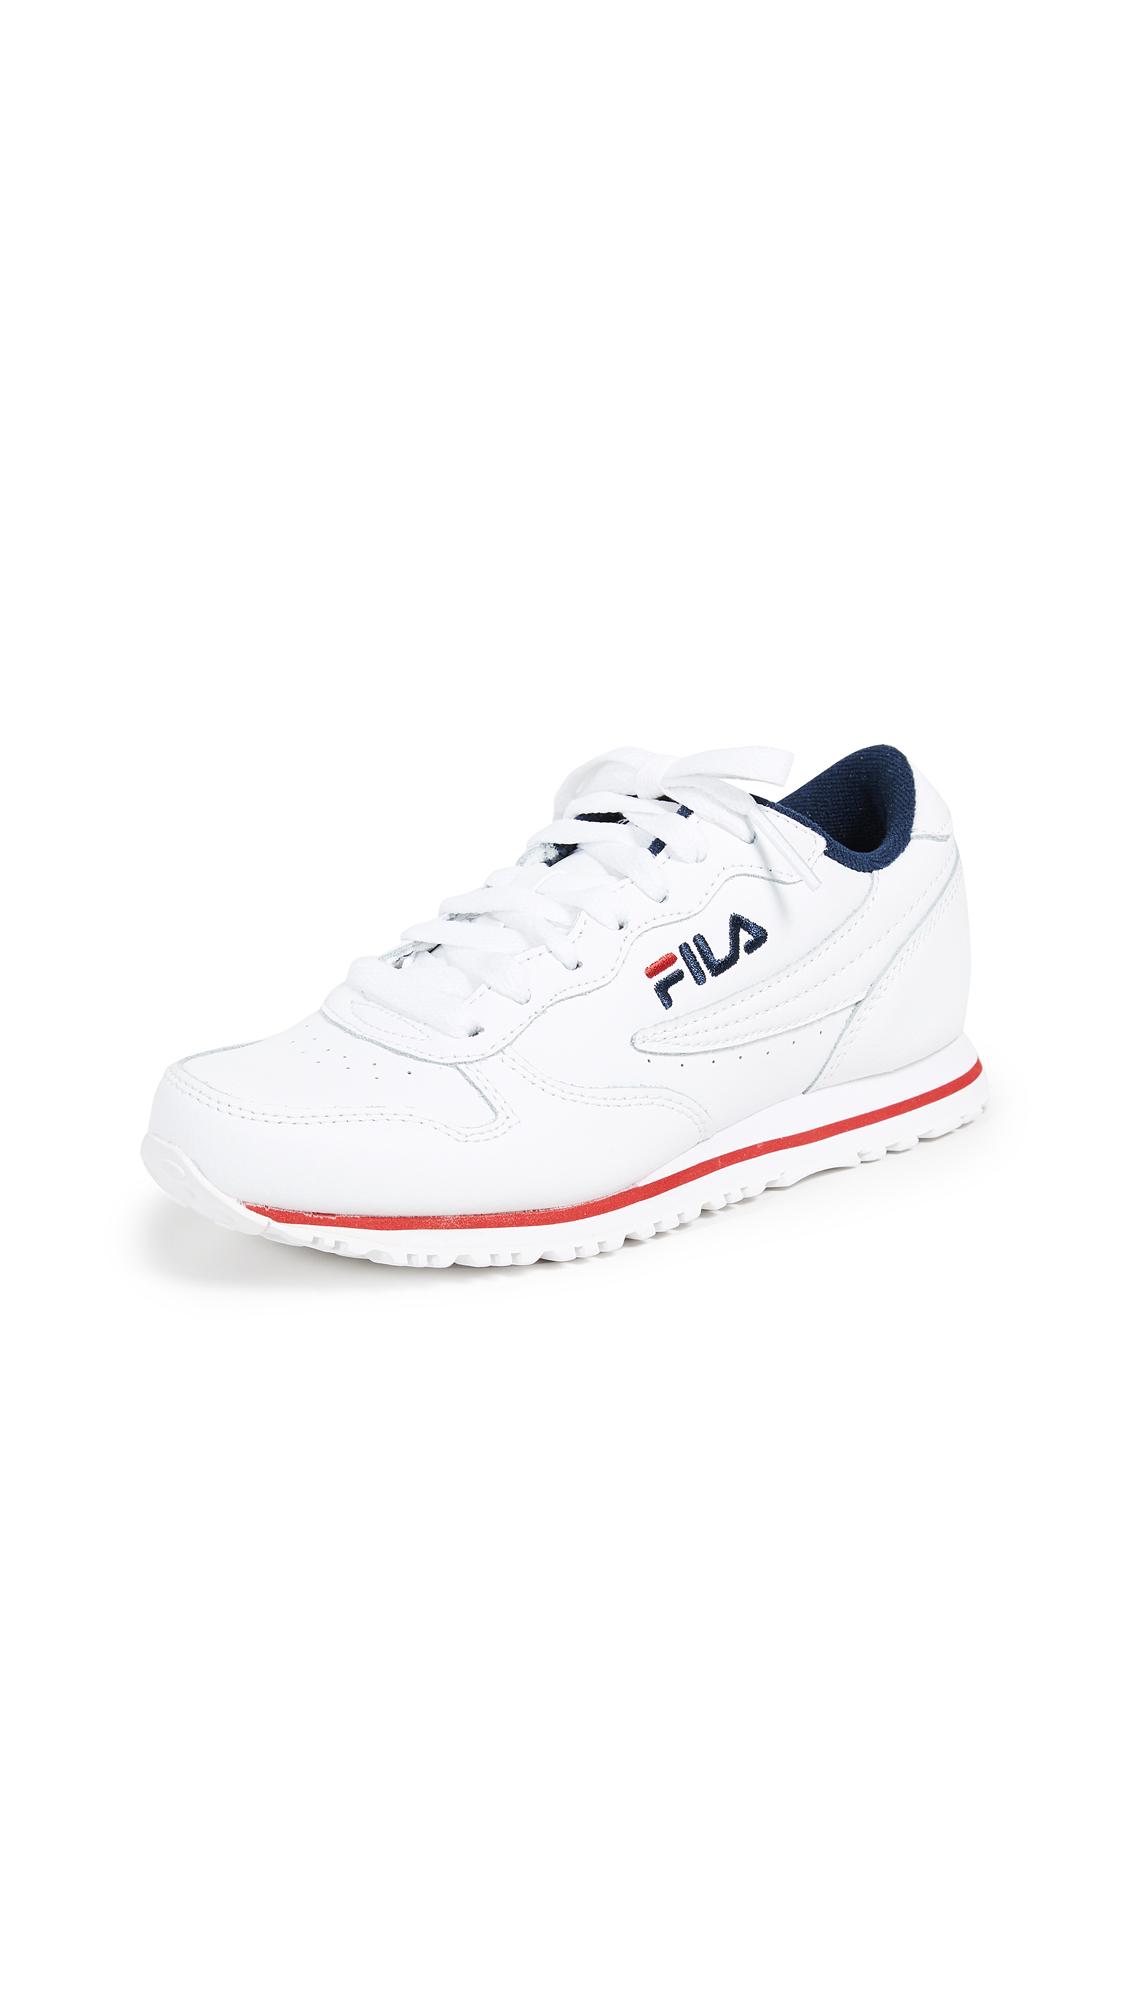 Fila Euro Jogger II Sneakers - White/Fila Navy/Fila Red